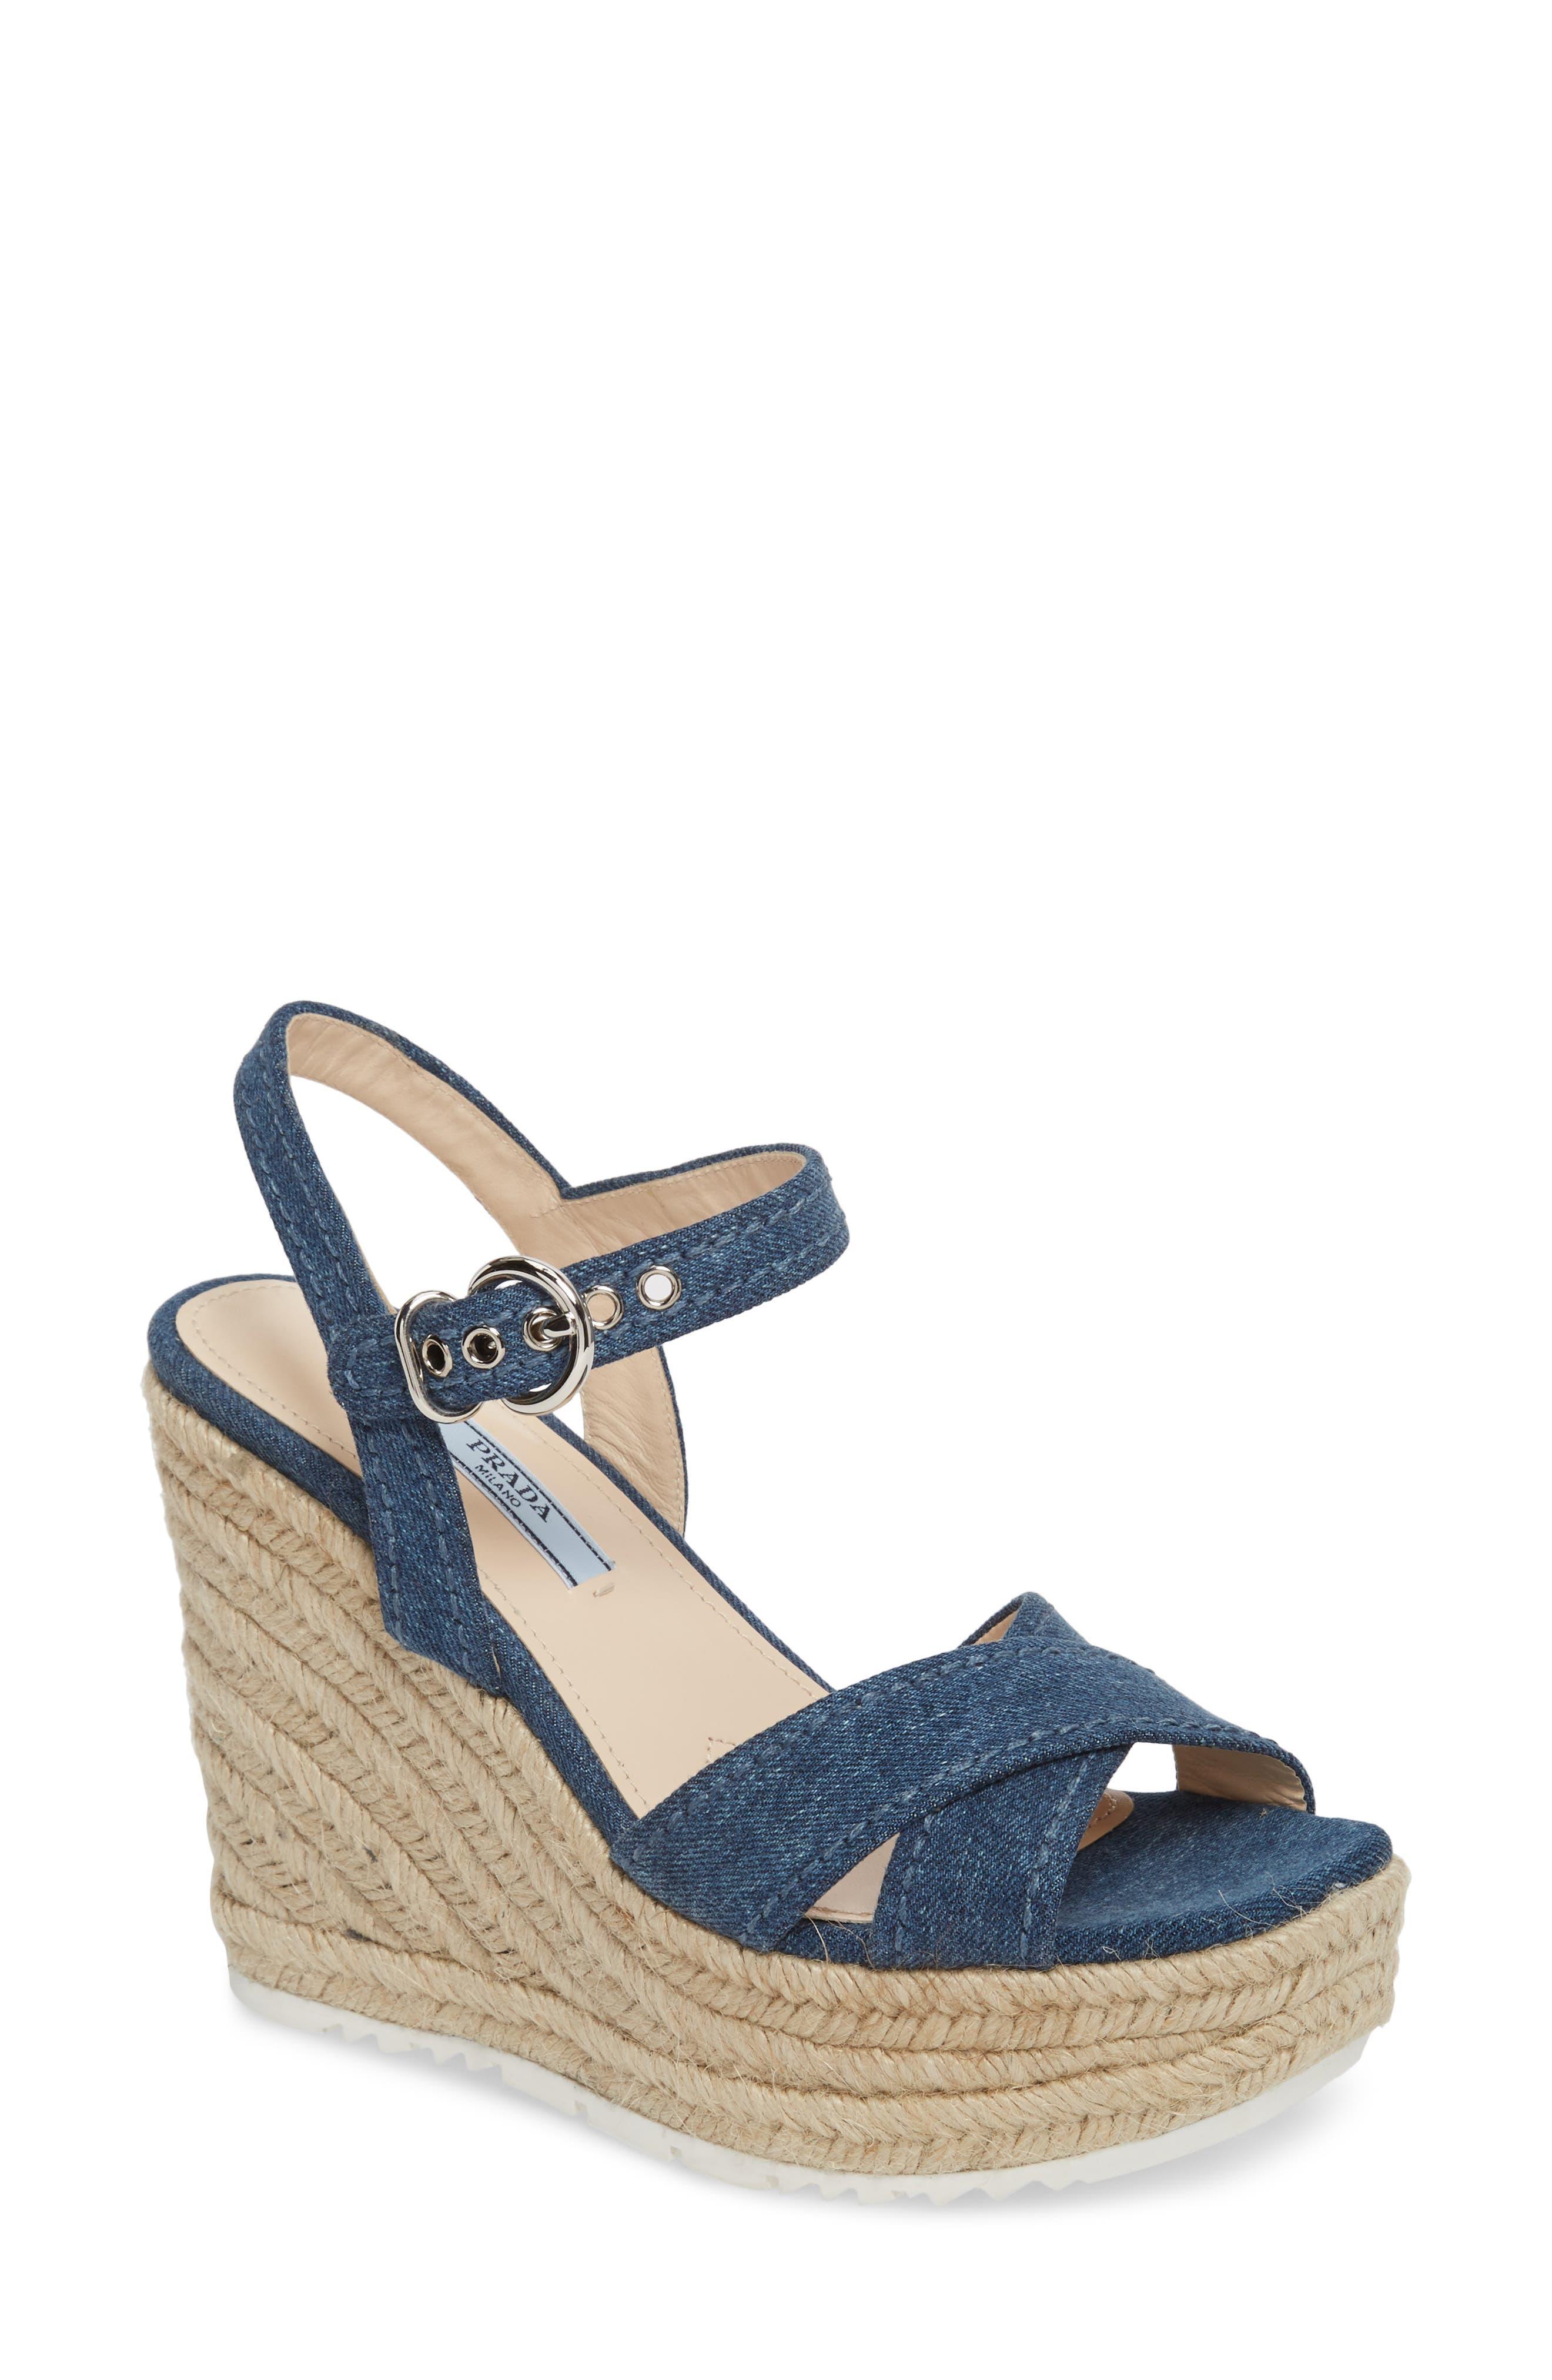 Espadrille Wedge Sandal,                         Main,                         color, Blue